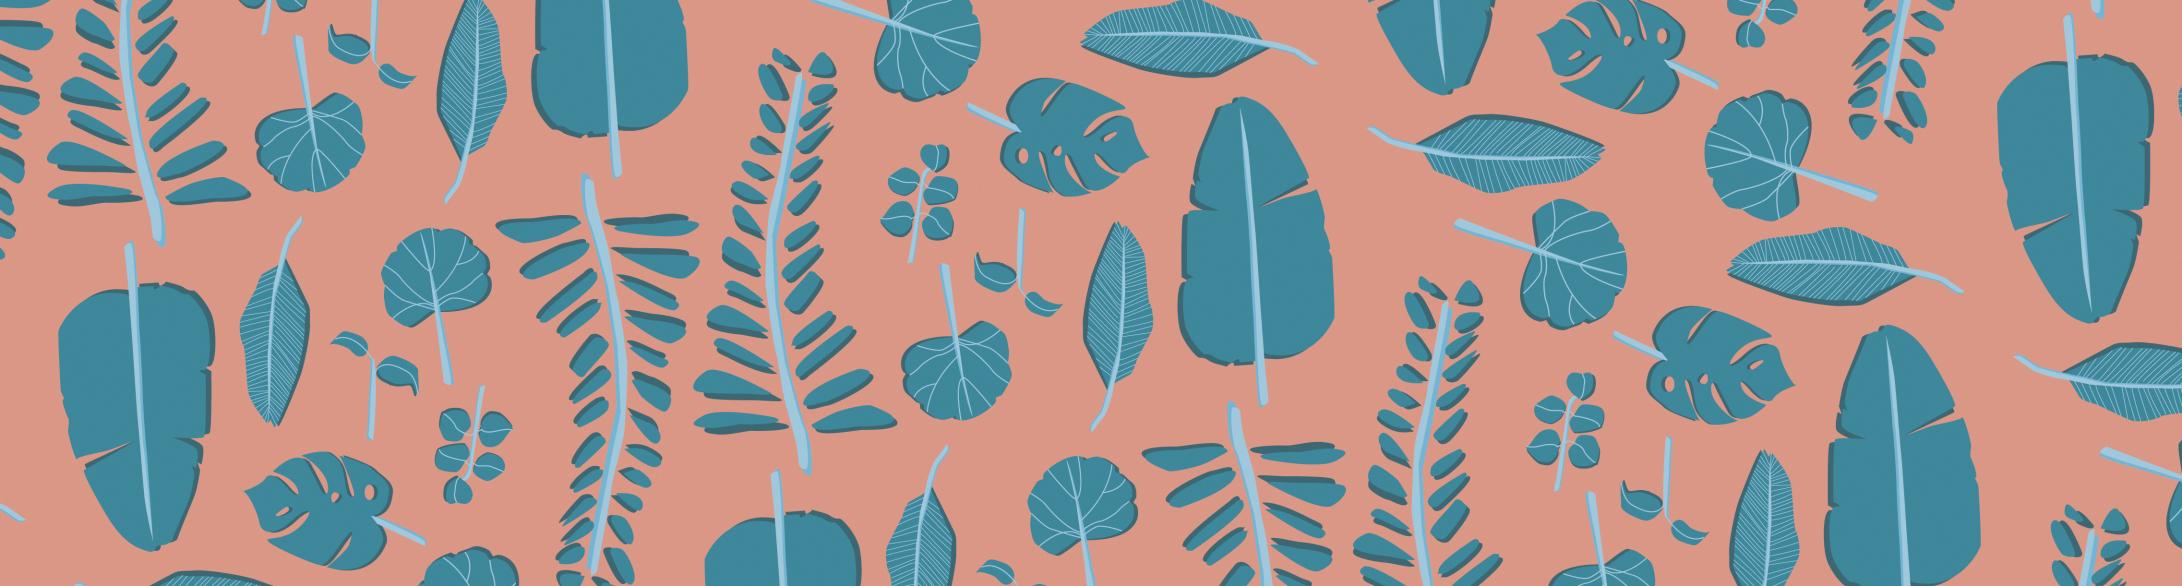 hsd-leaves-pattern-03.jpg